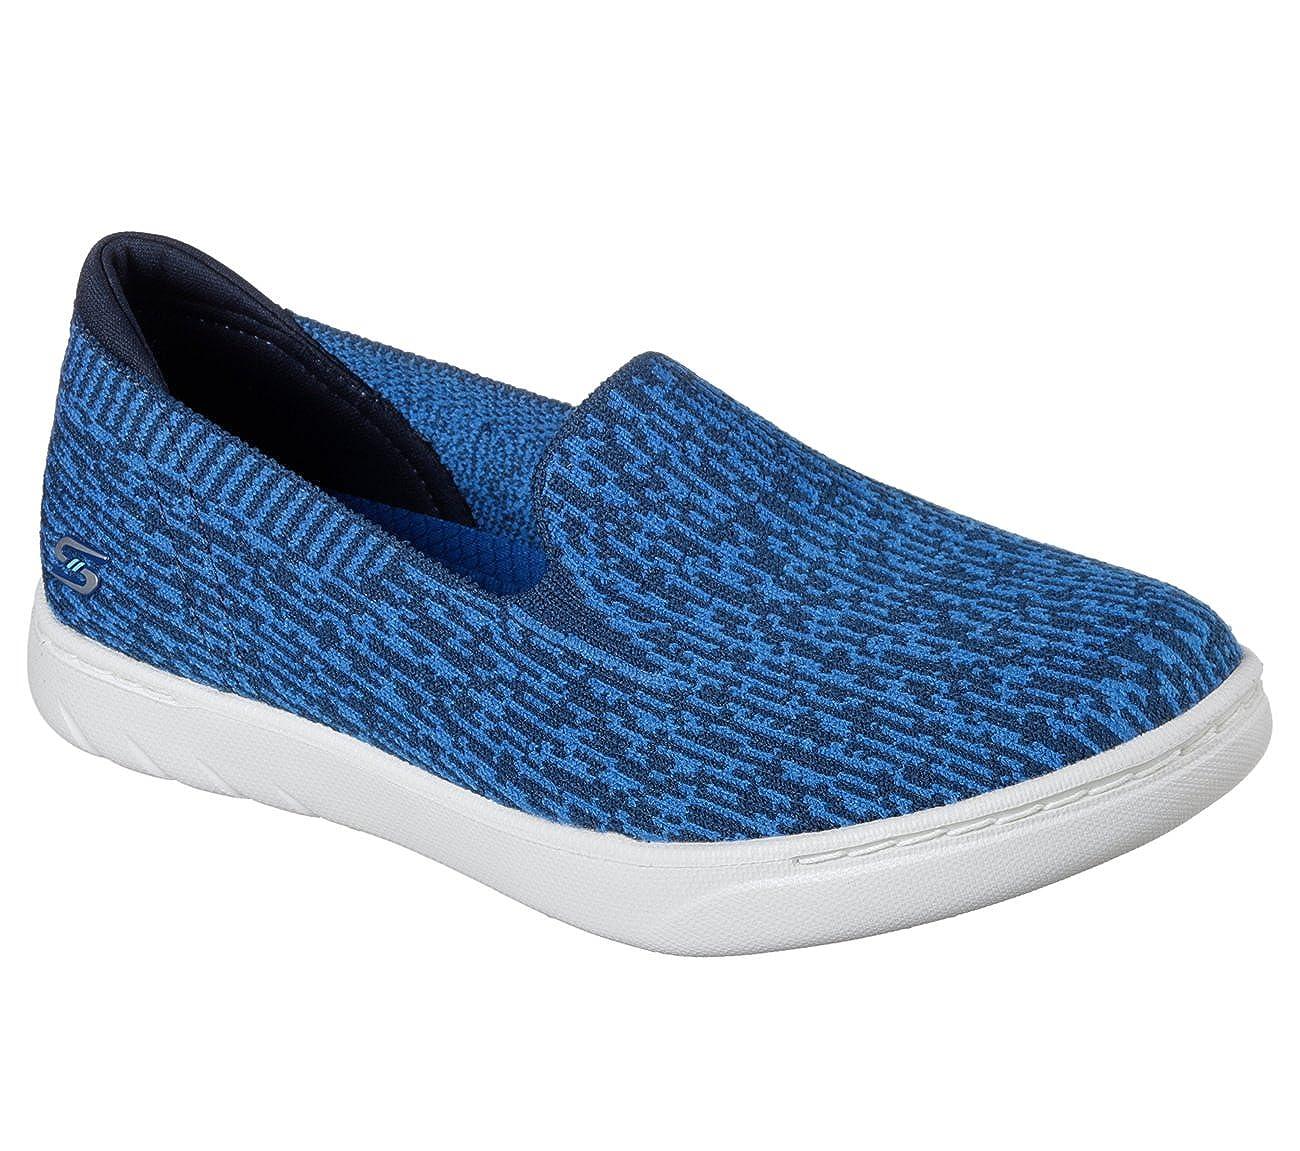 Skechers Active Millennial-23535 Damens's Slip Blau On Navy, Blau Slip 60115d